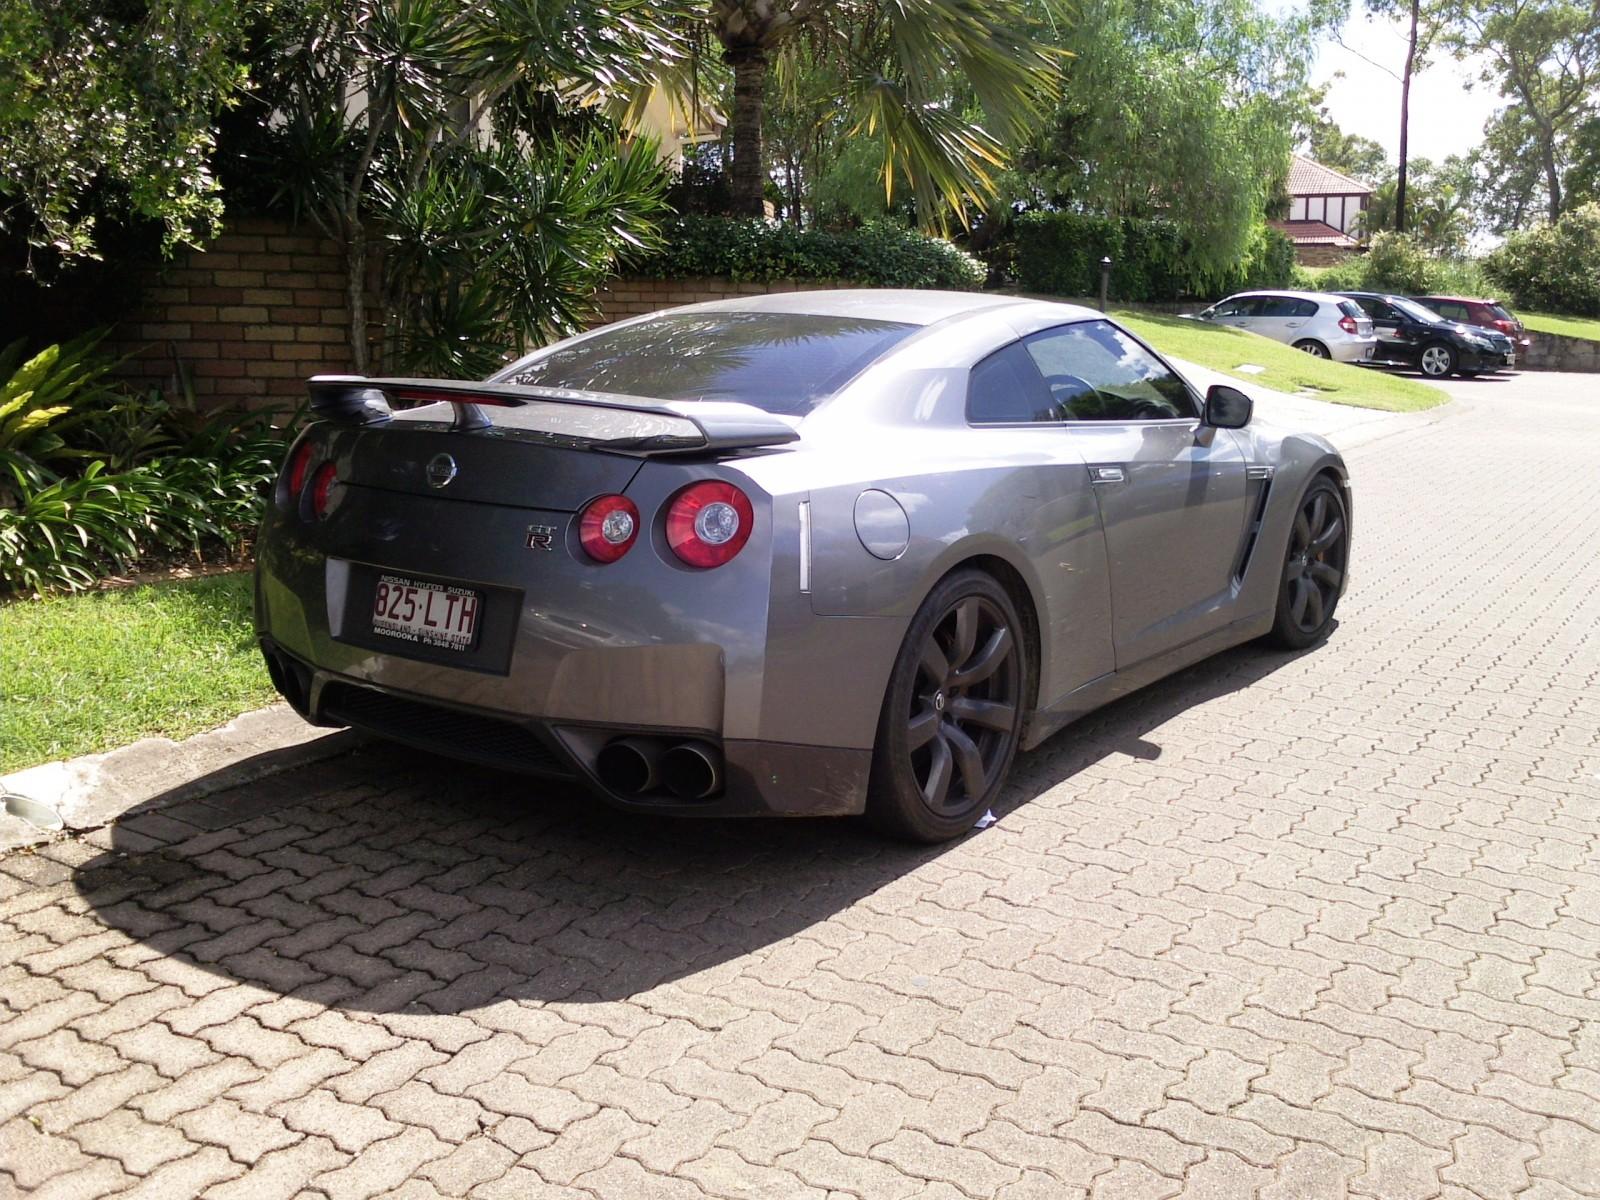 Nissan Skyline GTR - Spotted